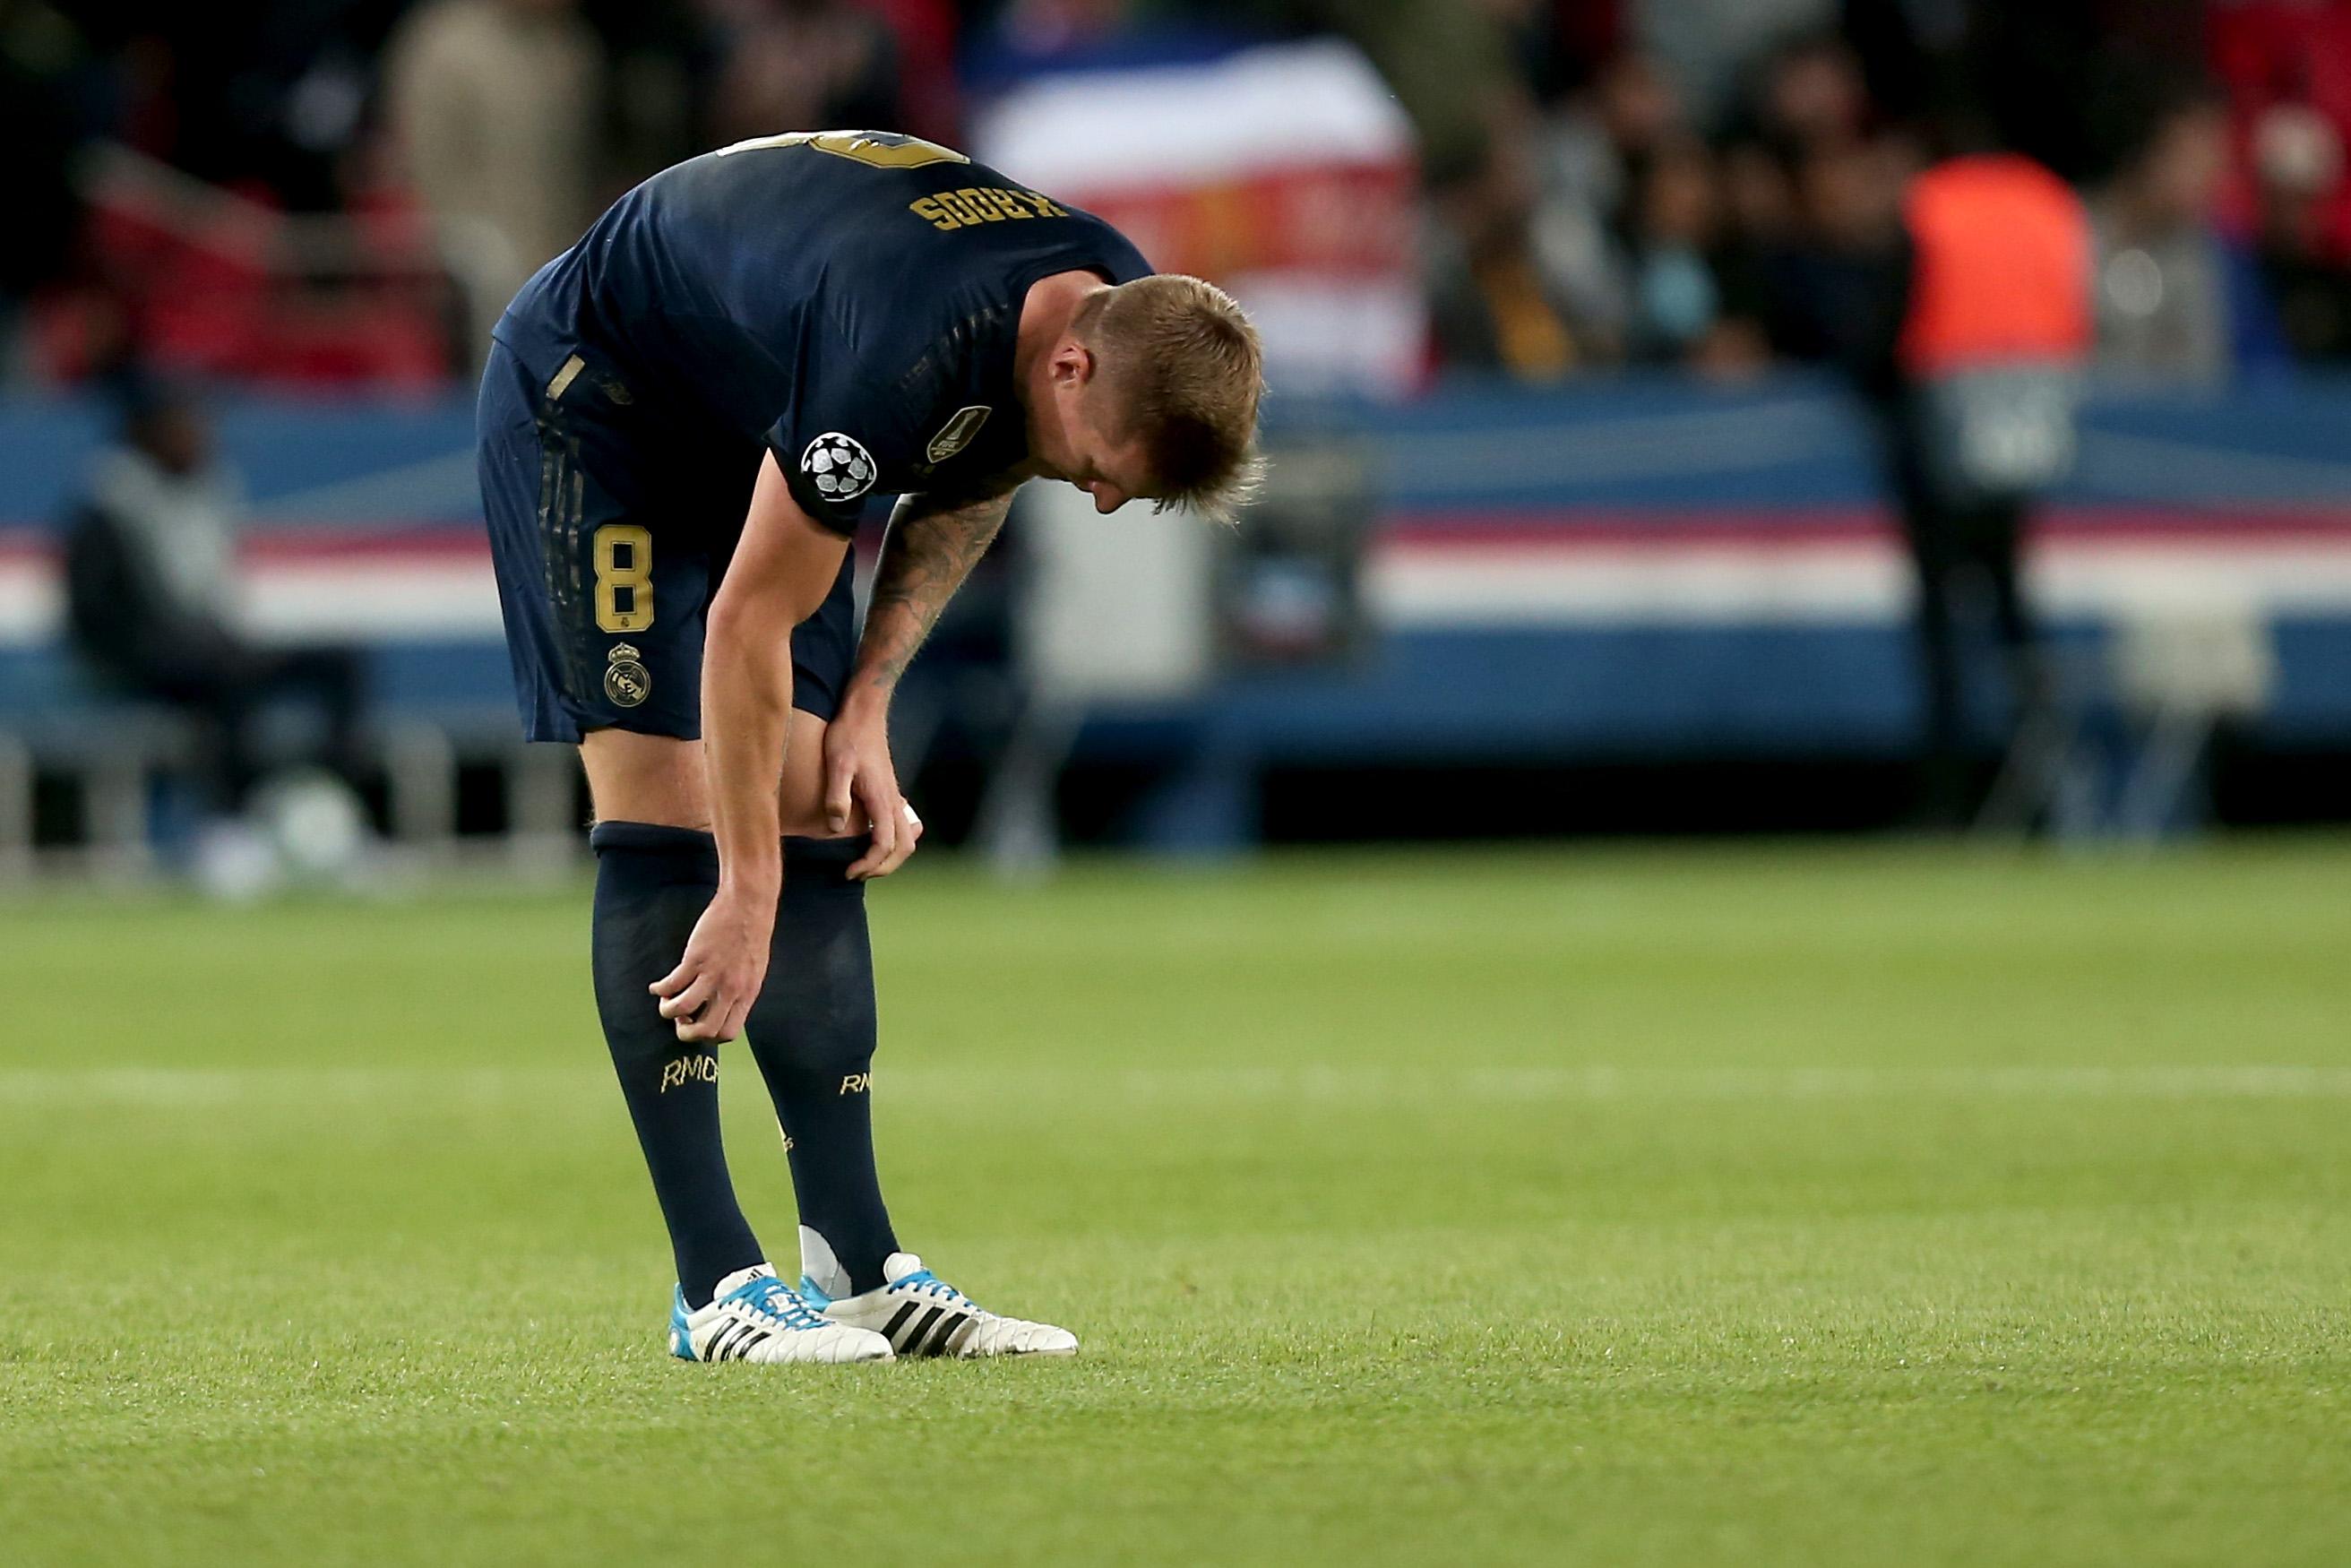 Paris Saint-Germain v Real Madrid: Group A - UEFA Champions League